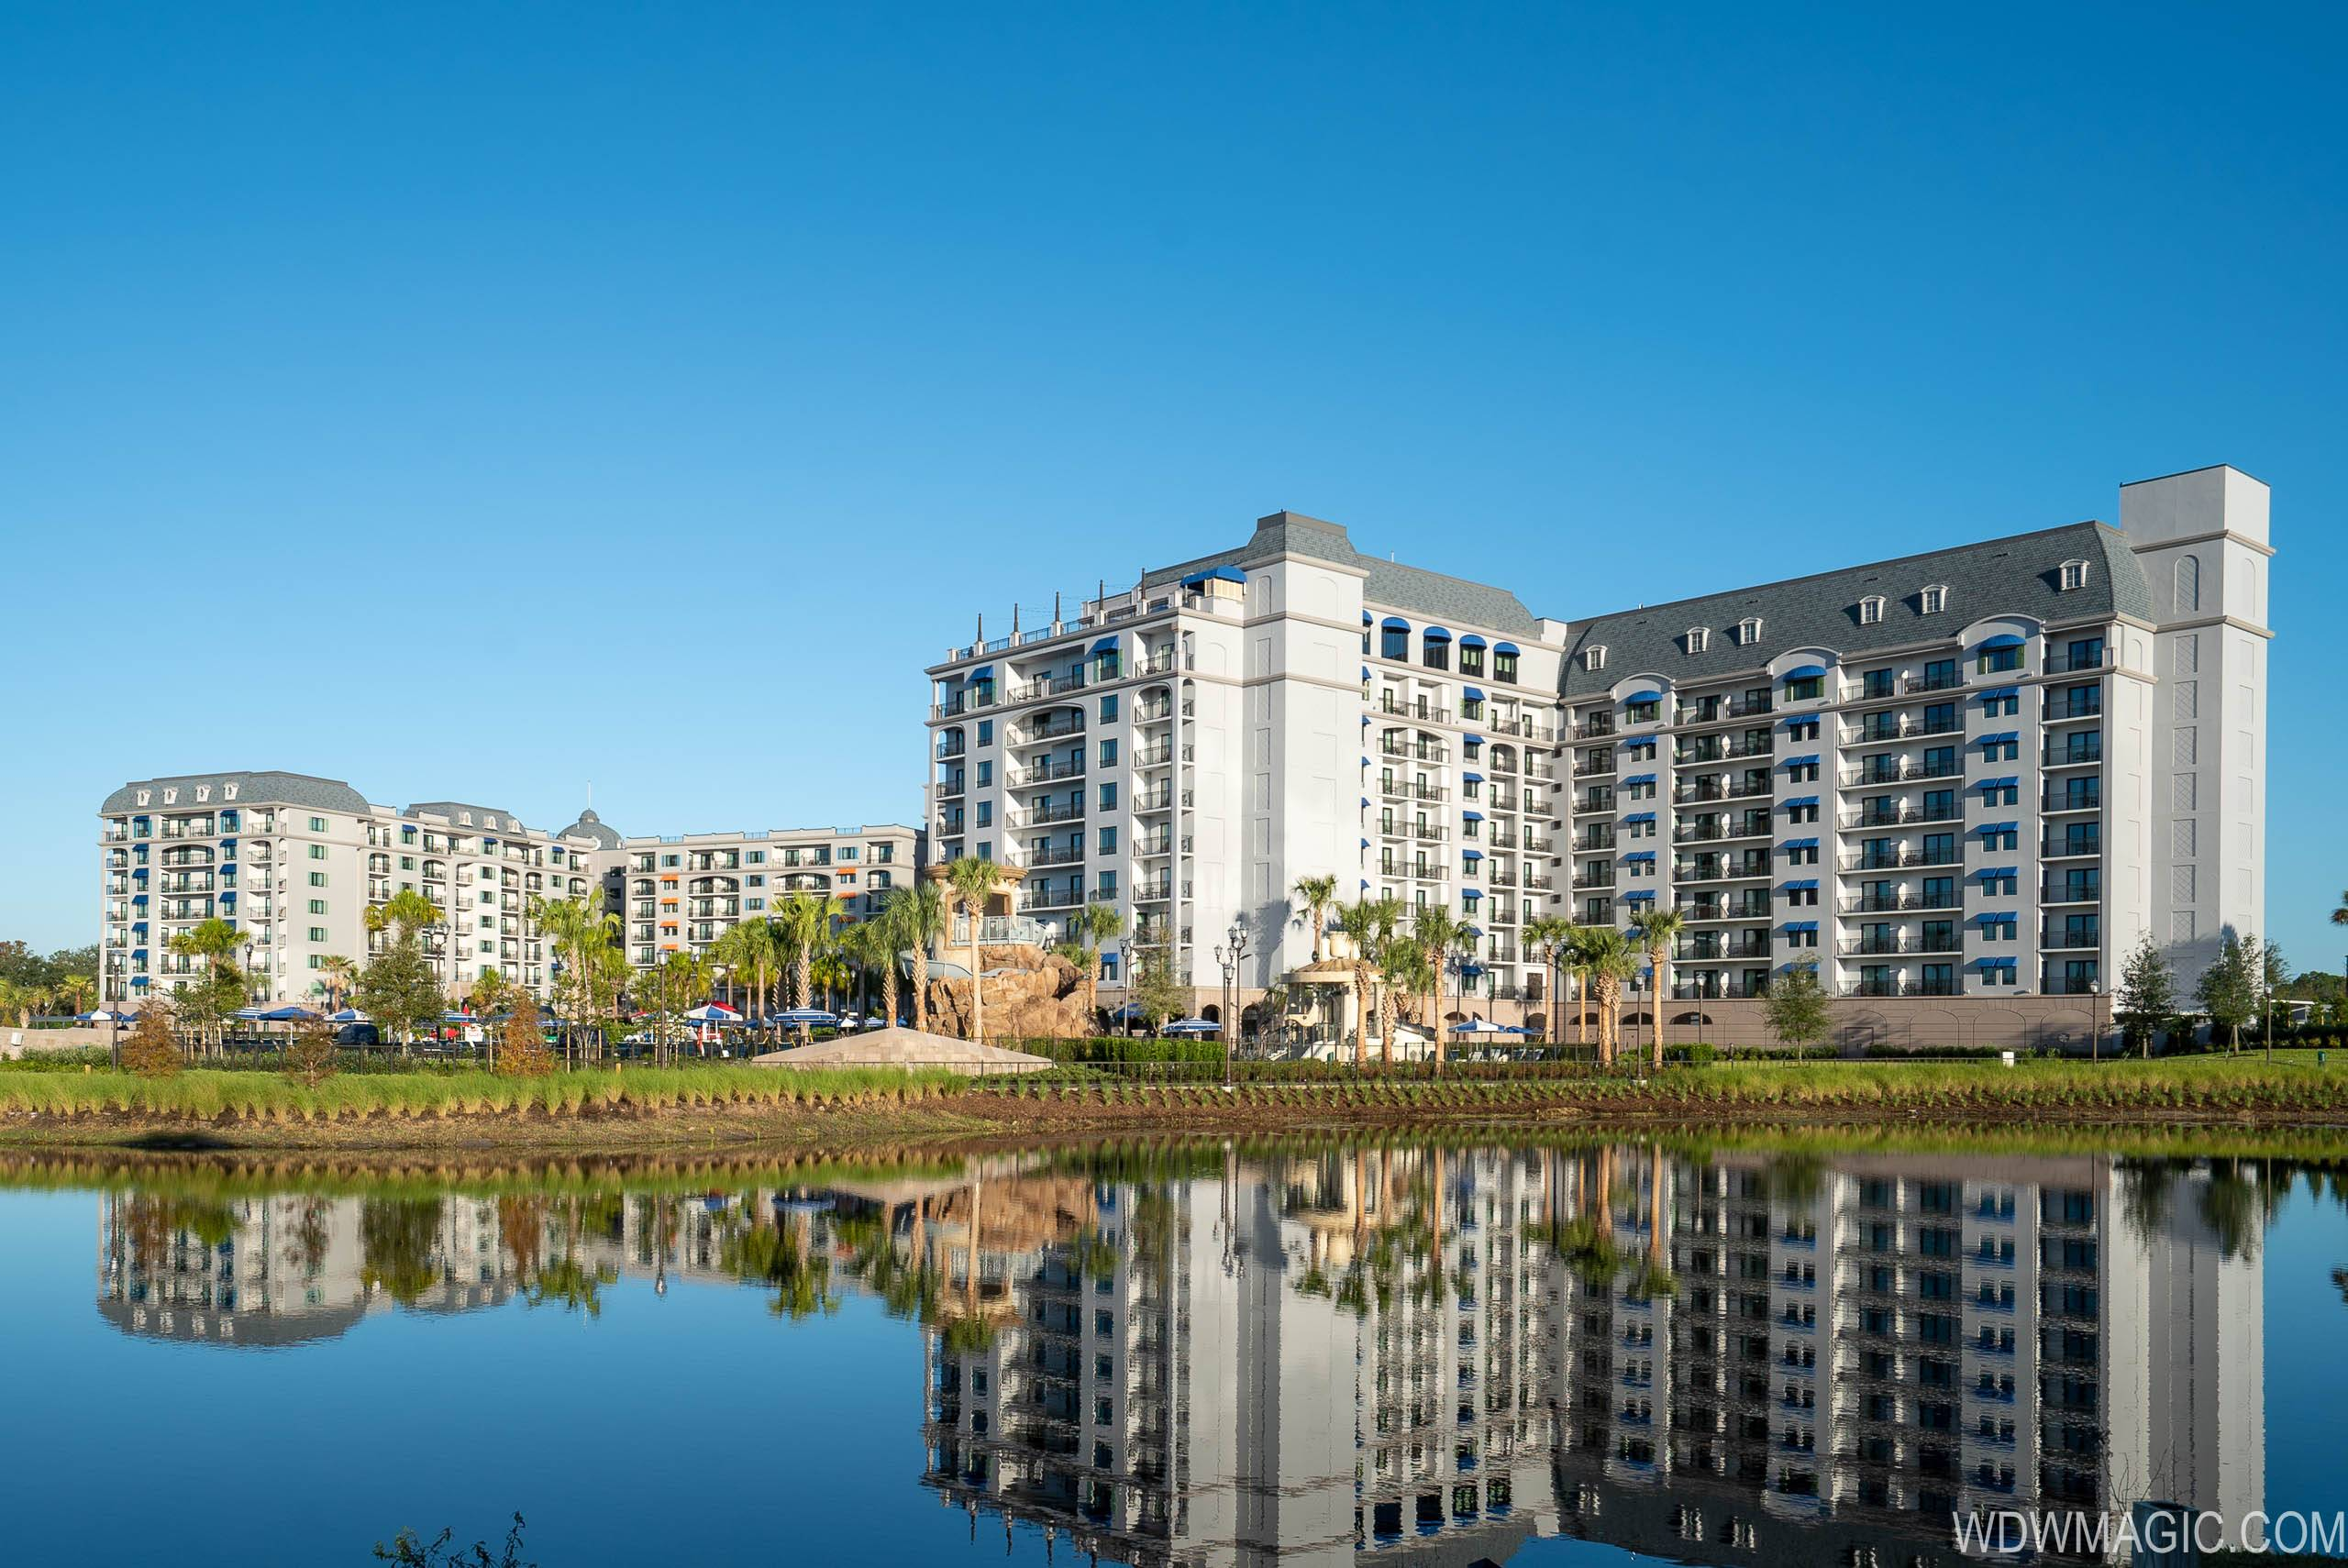 Walt Disney World Resorts overview